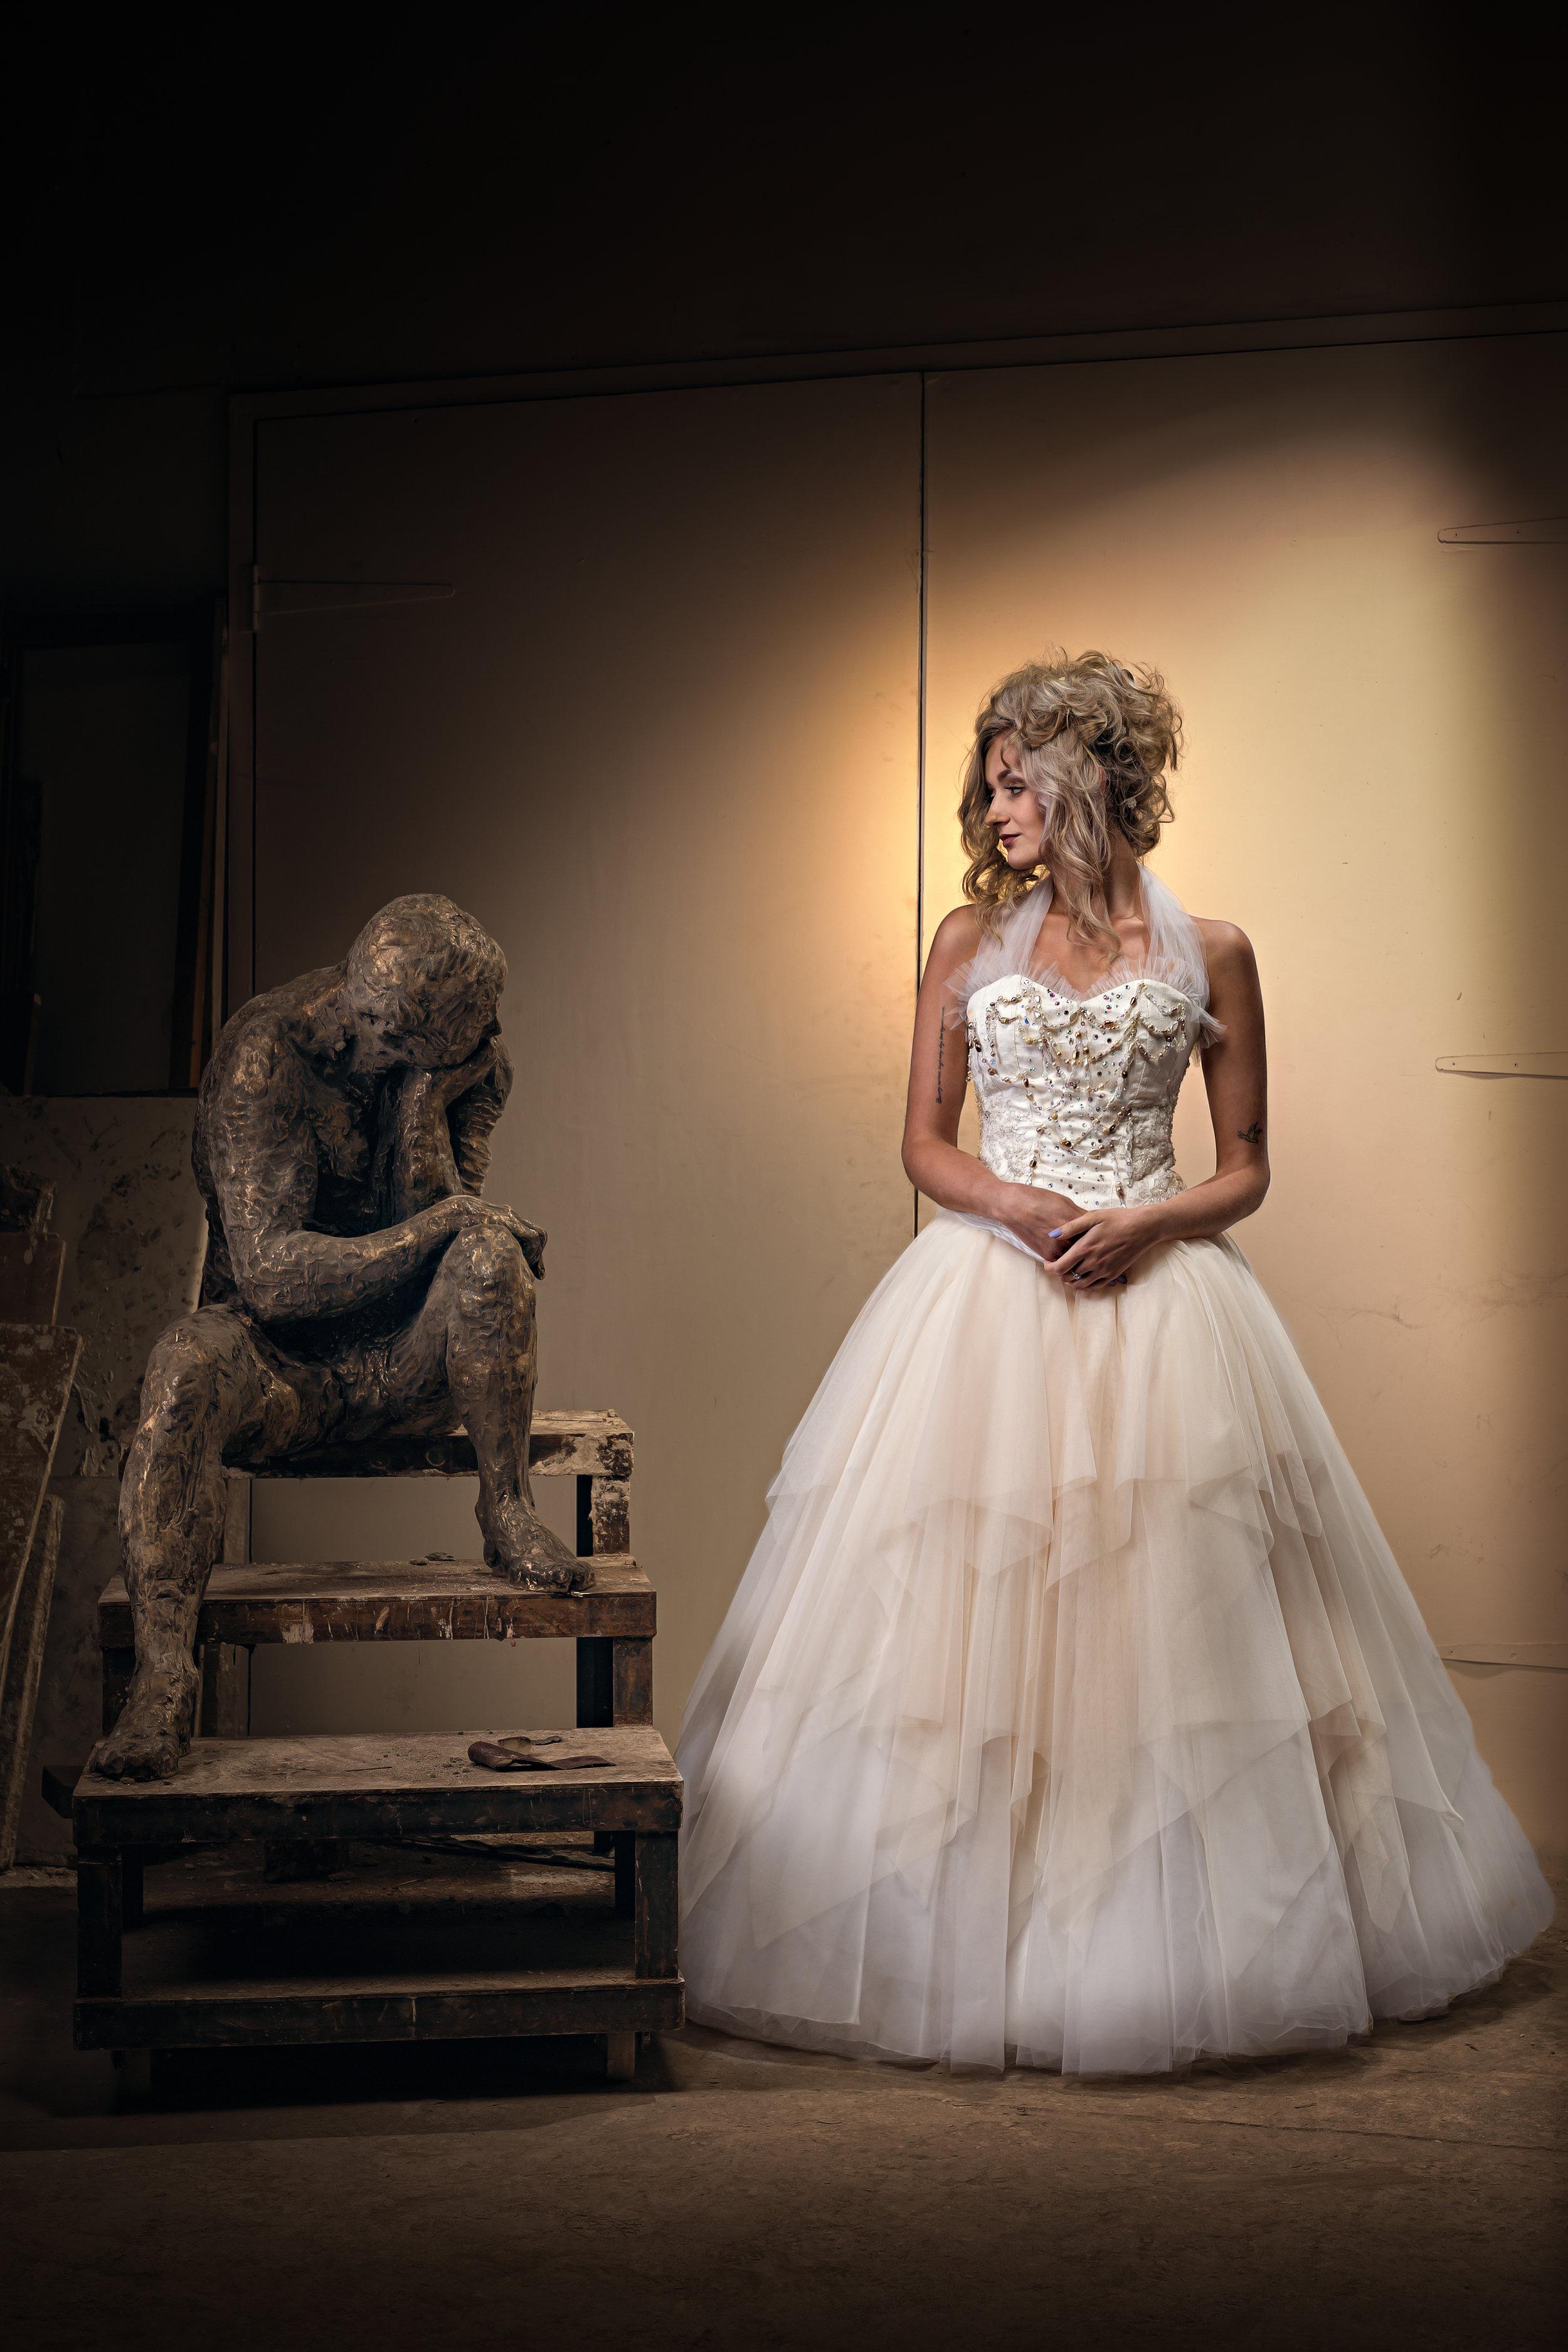 Martin Dobson Couture - Bespoke wedding dress - Suffolk - 0288 - September 17, 2017 - copyright Foyers Photography-Edit--® Robert Foyers - All Rights Reserved-3466 x 5199.JPG